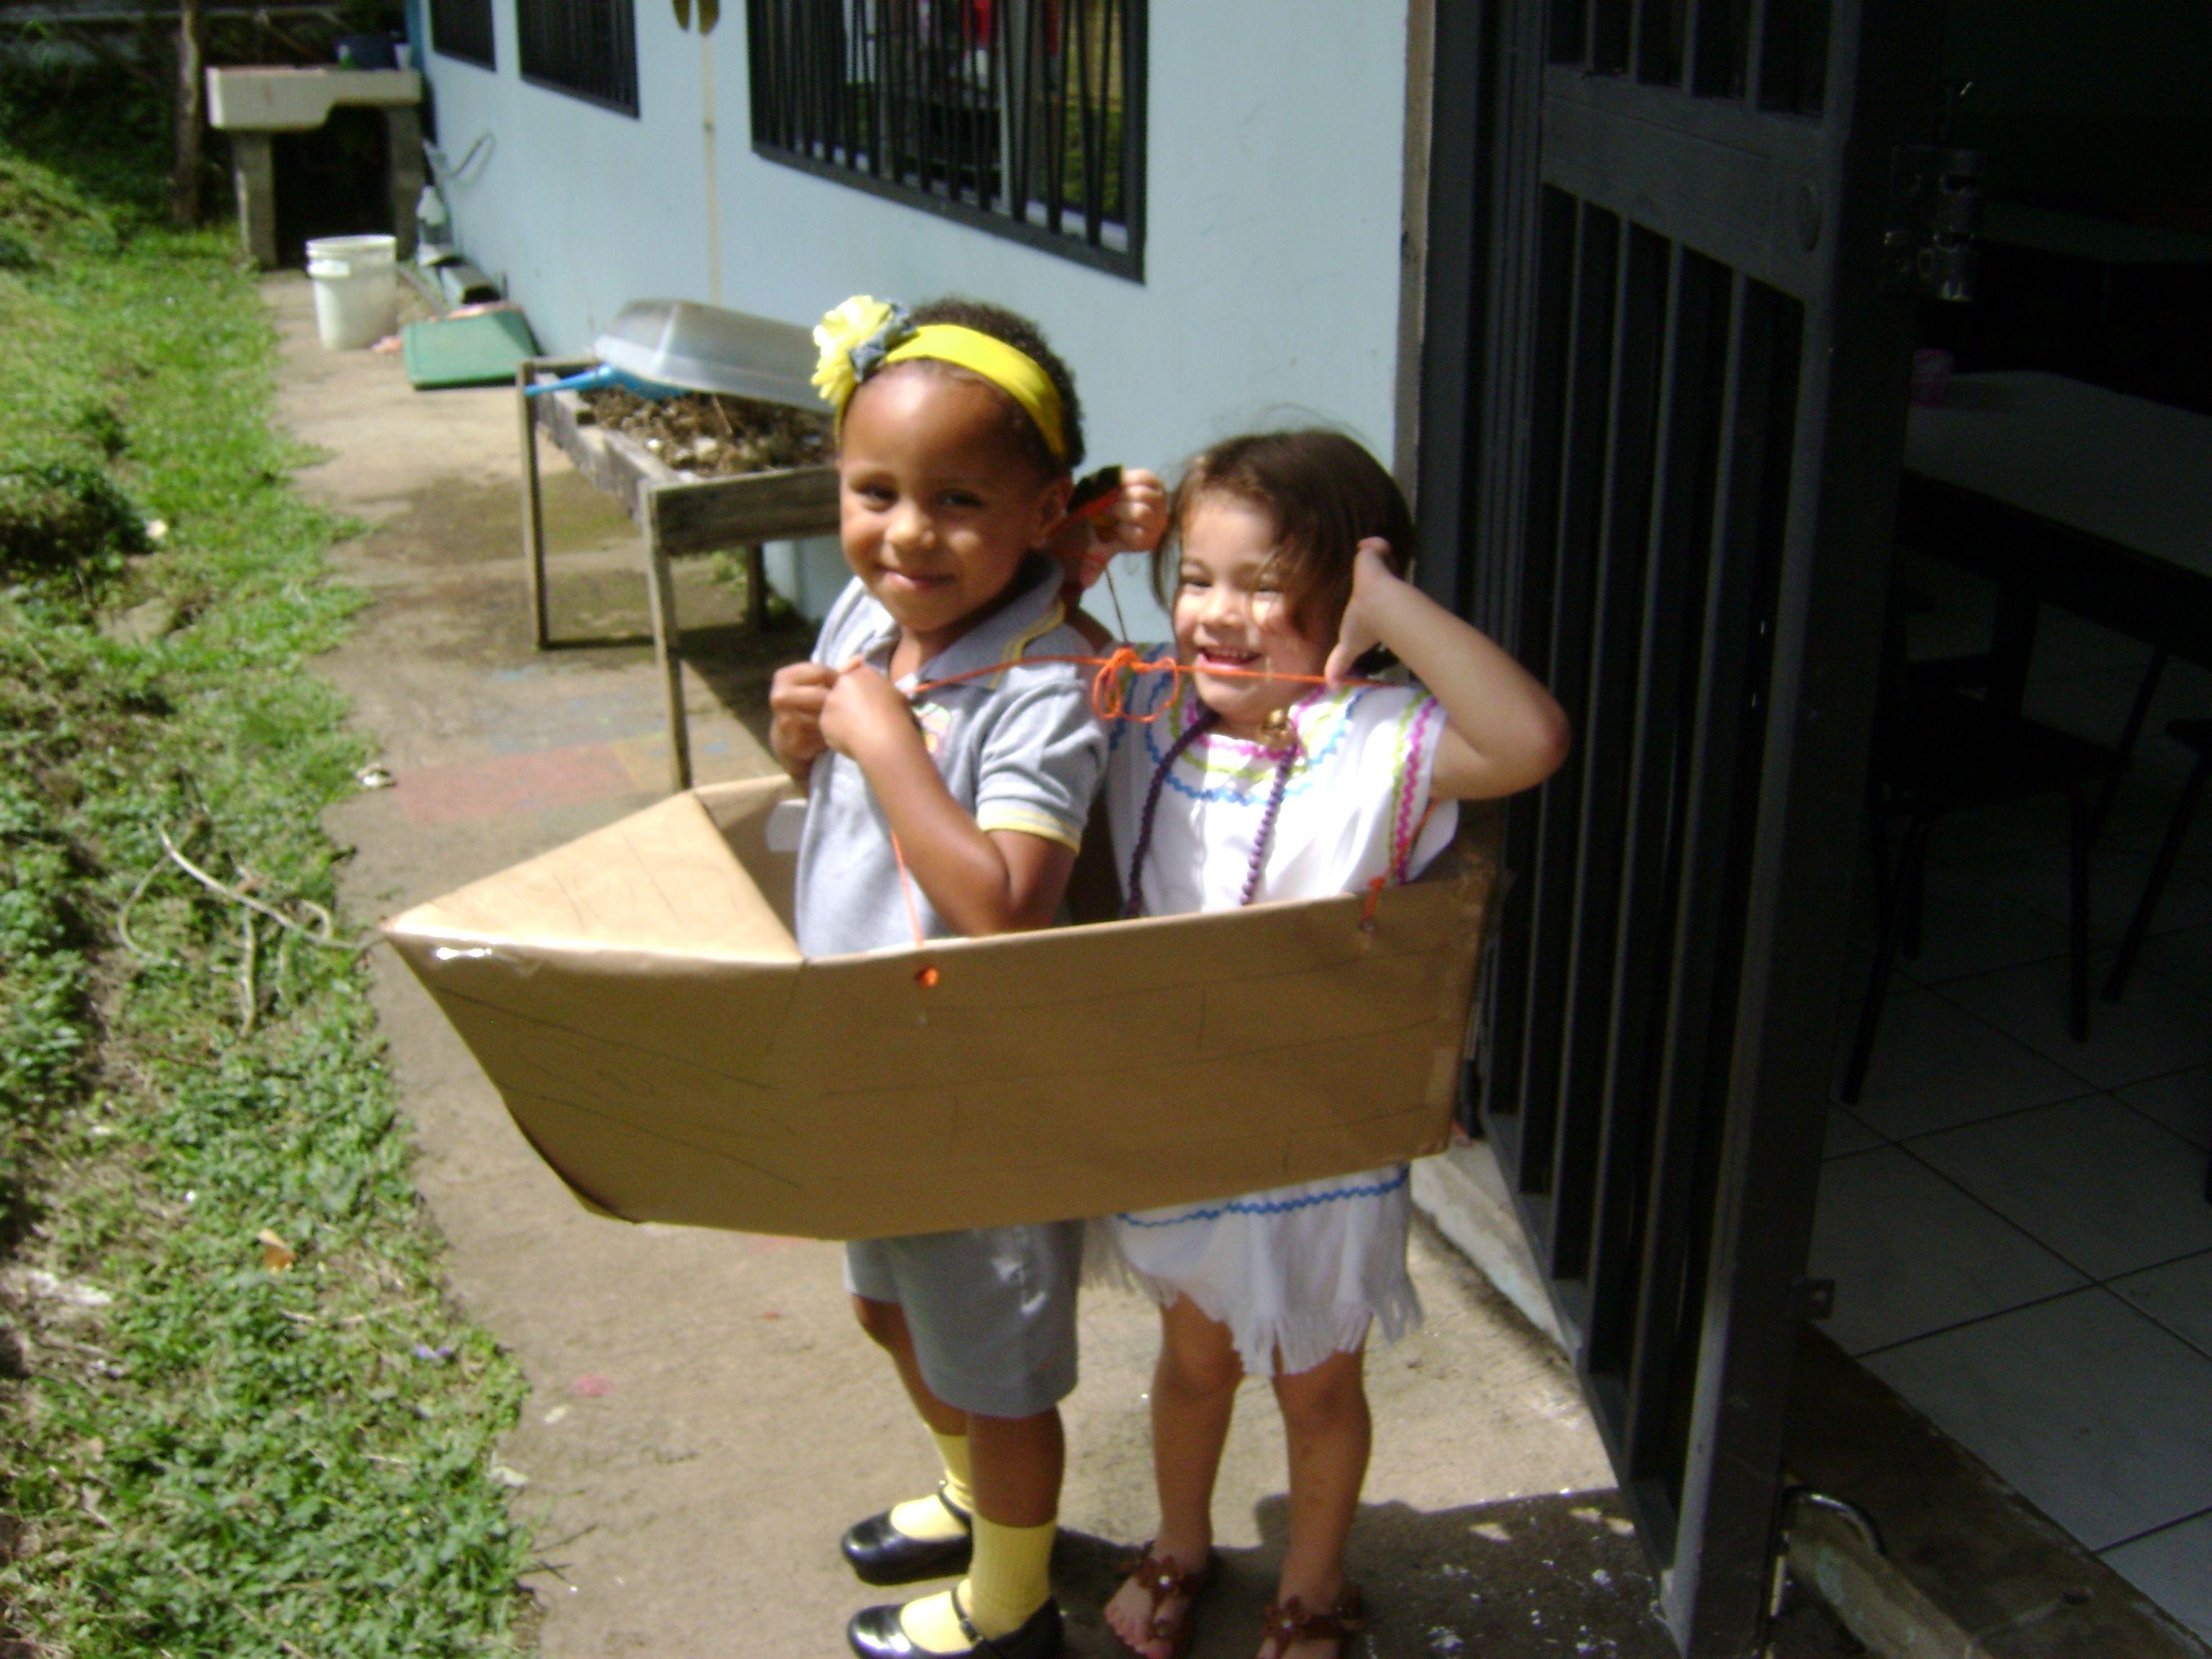 Boat made with a cardboard box kids role play cardboard